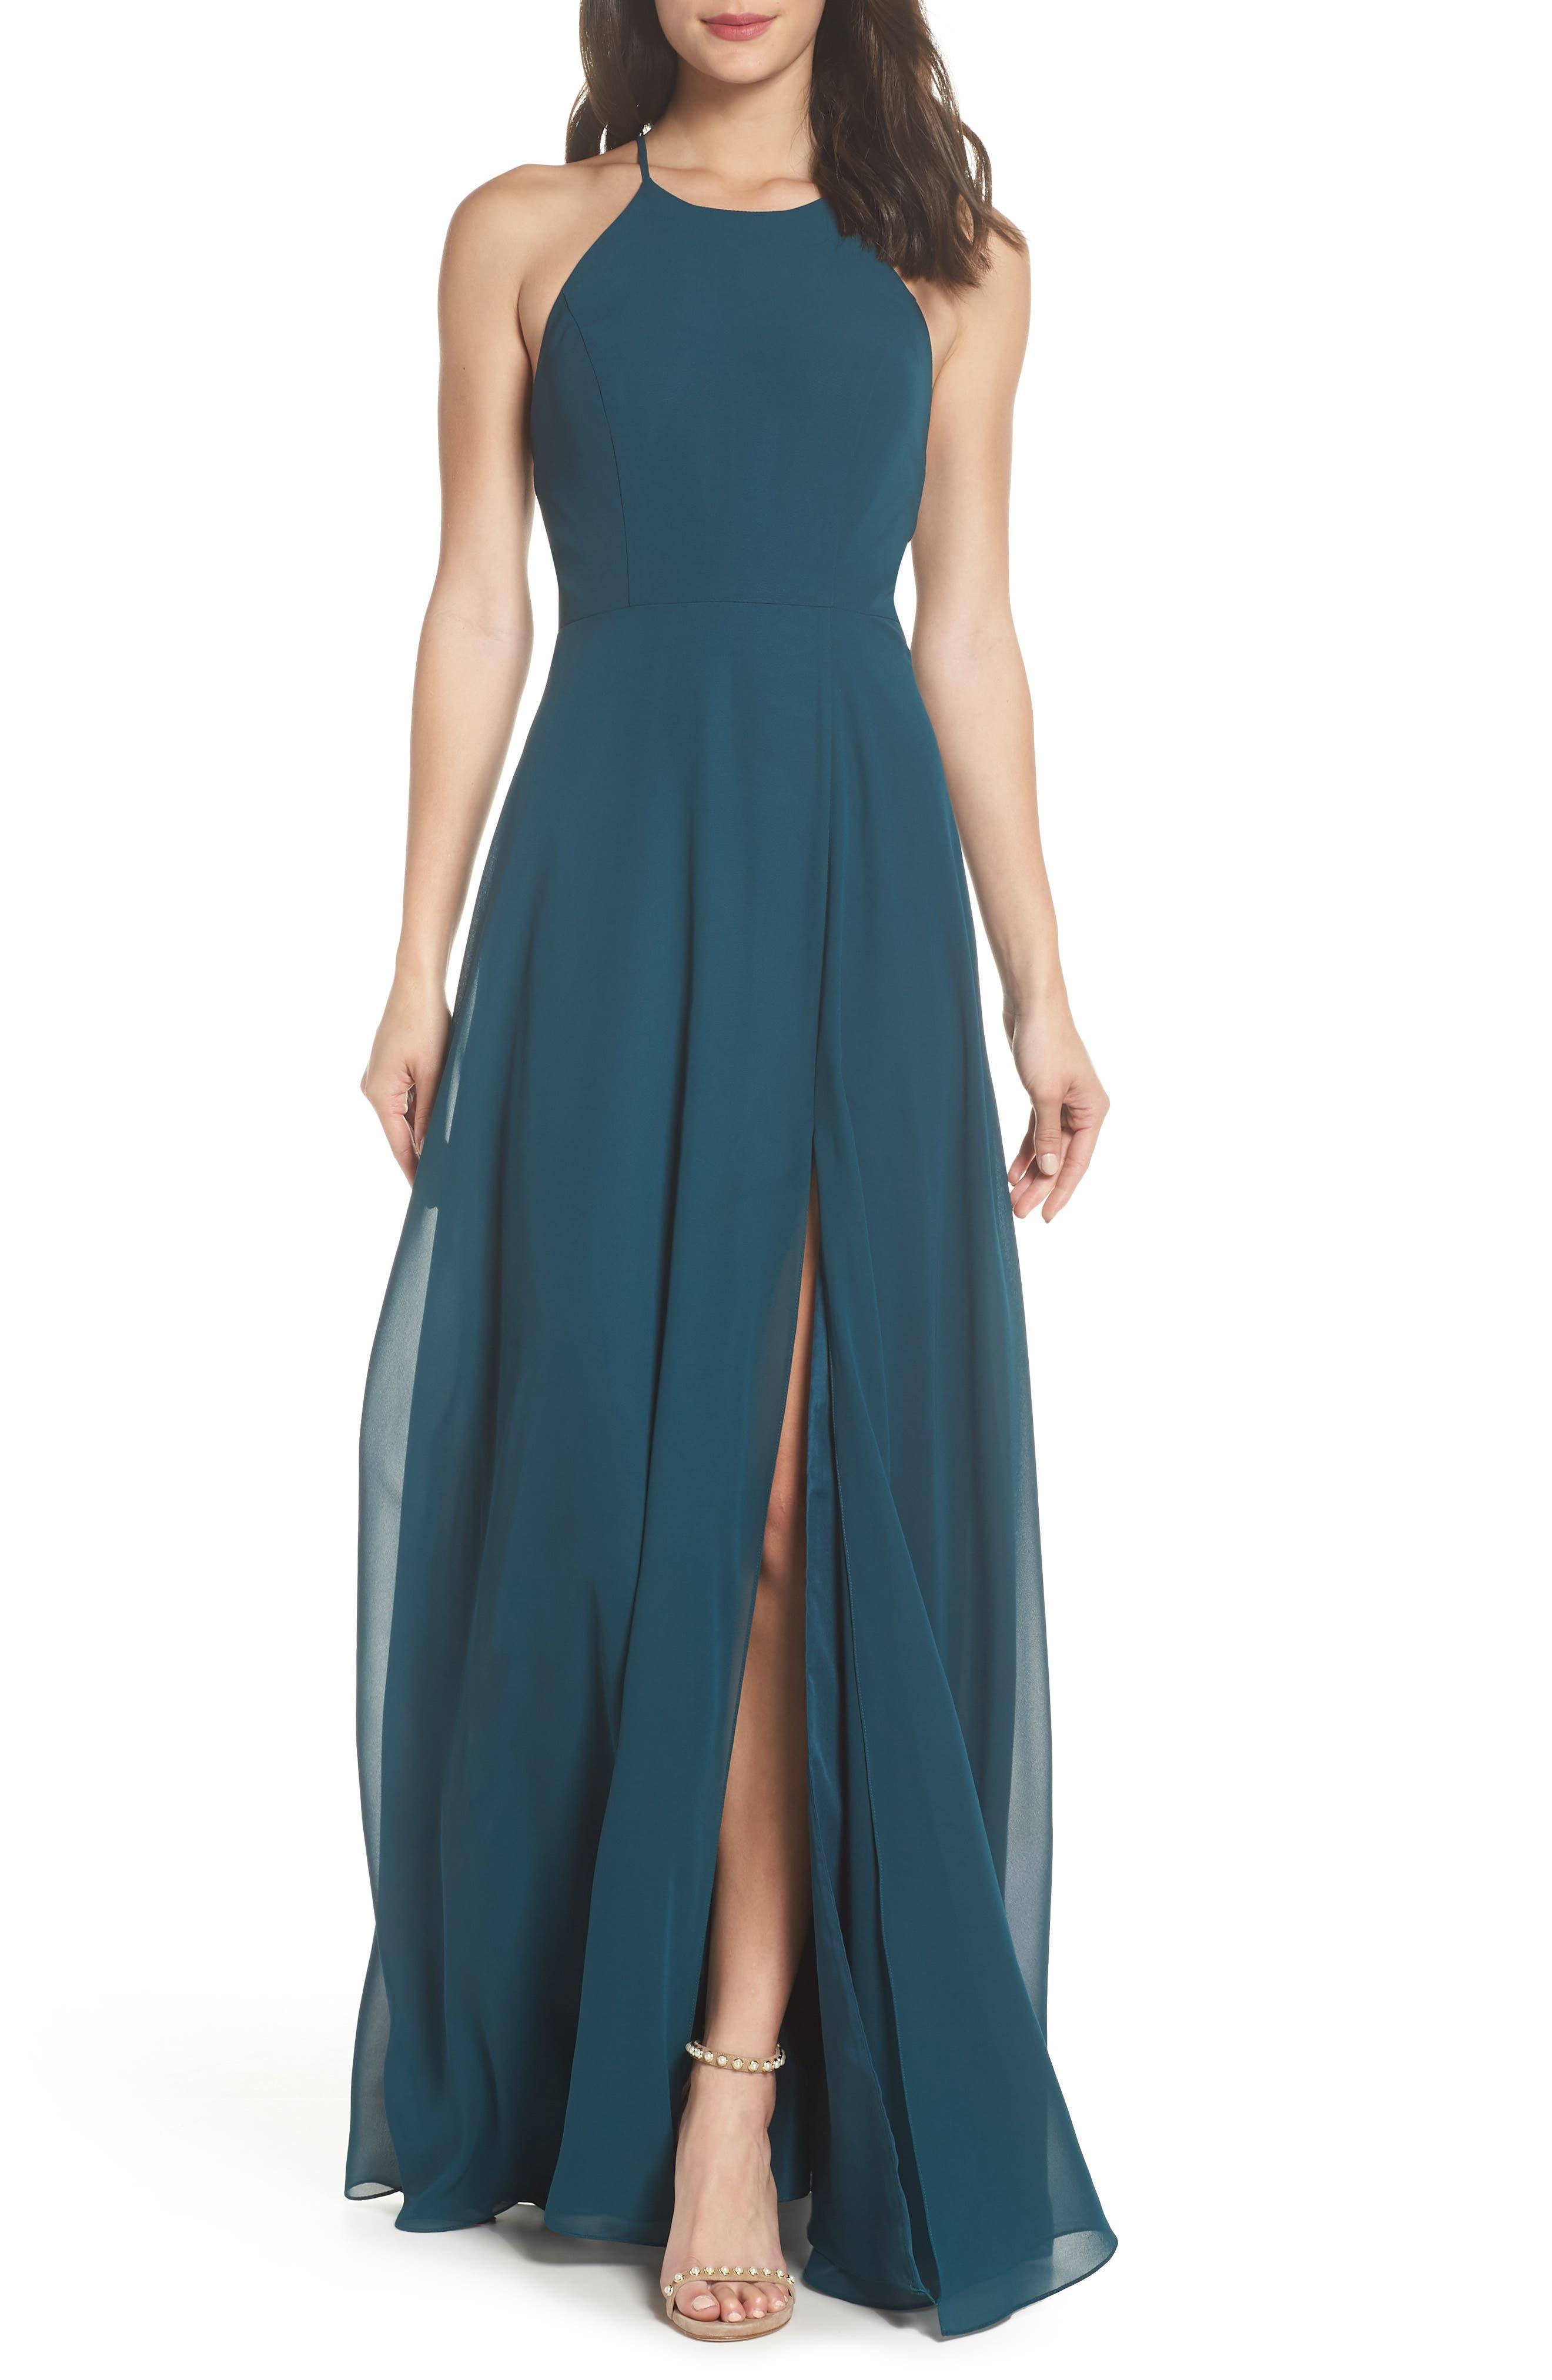 Alternate Image 1 Selected - Jenny Yoo Kayla A-Line Halter Gown